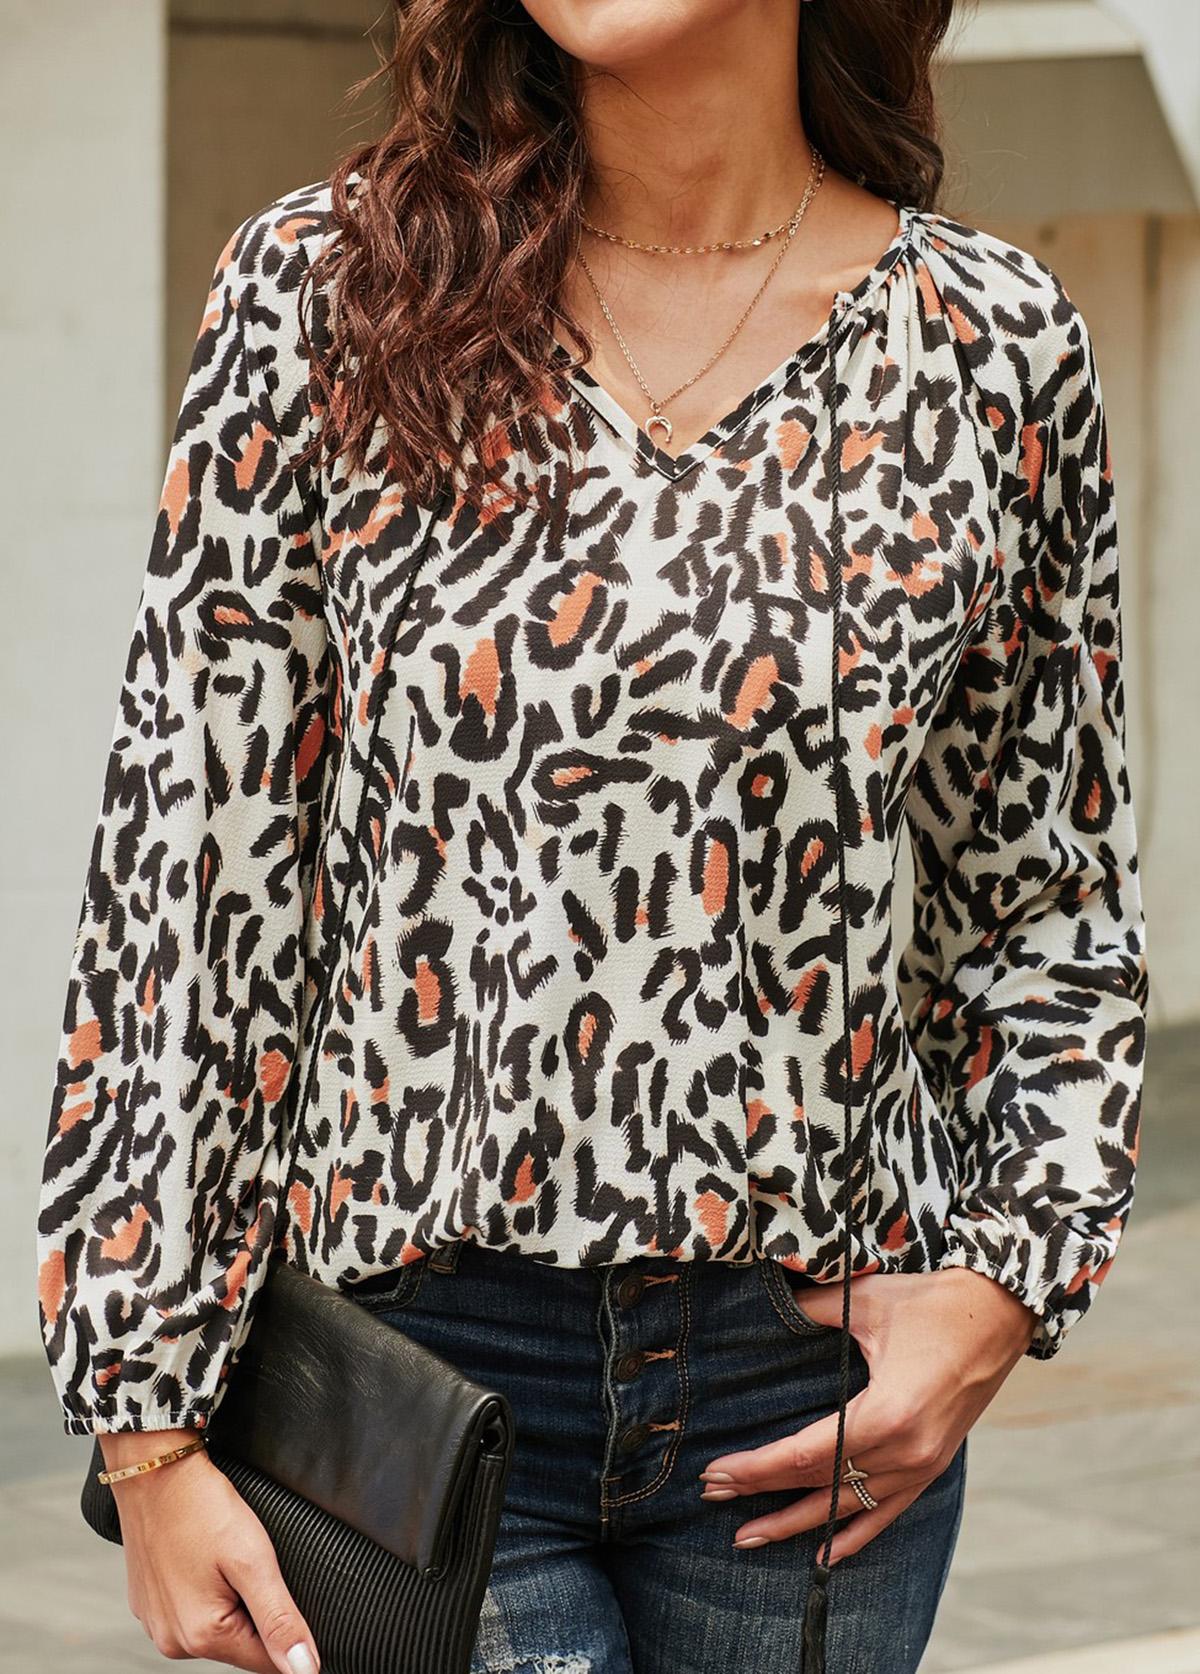 Leopard Print V Neck Tassel Tie Blouse